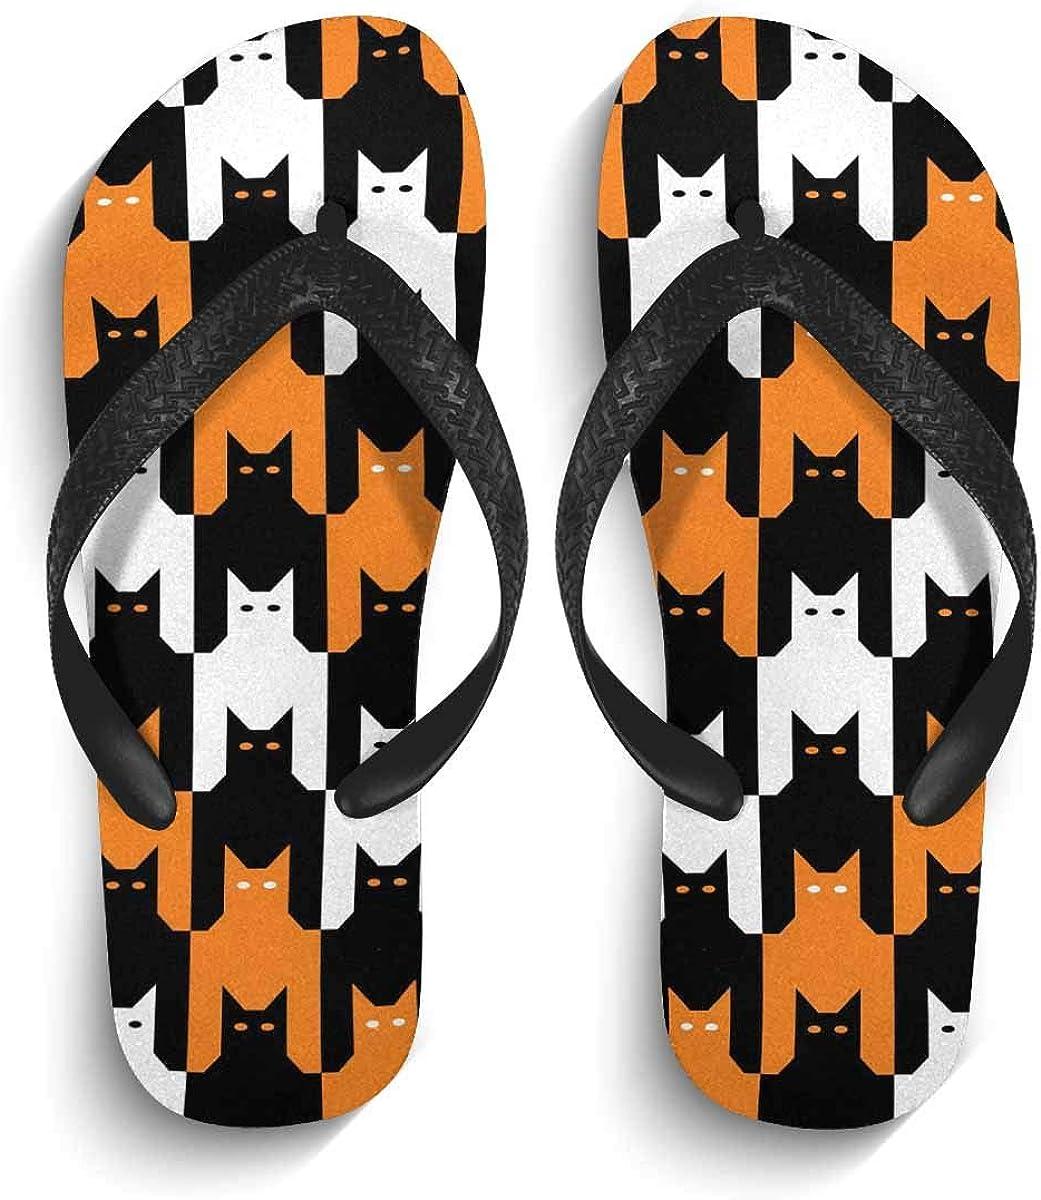 InterestPrint Men's Non-Slip Flip Flop Slippers Cats Collection Beach Thong Sandal